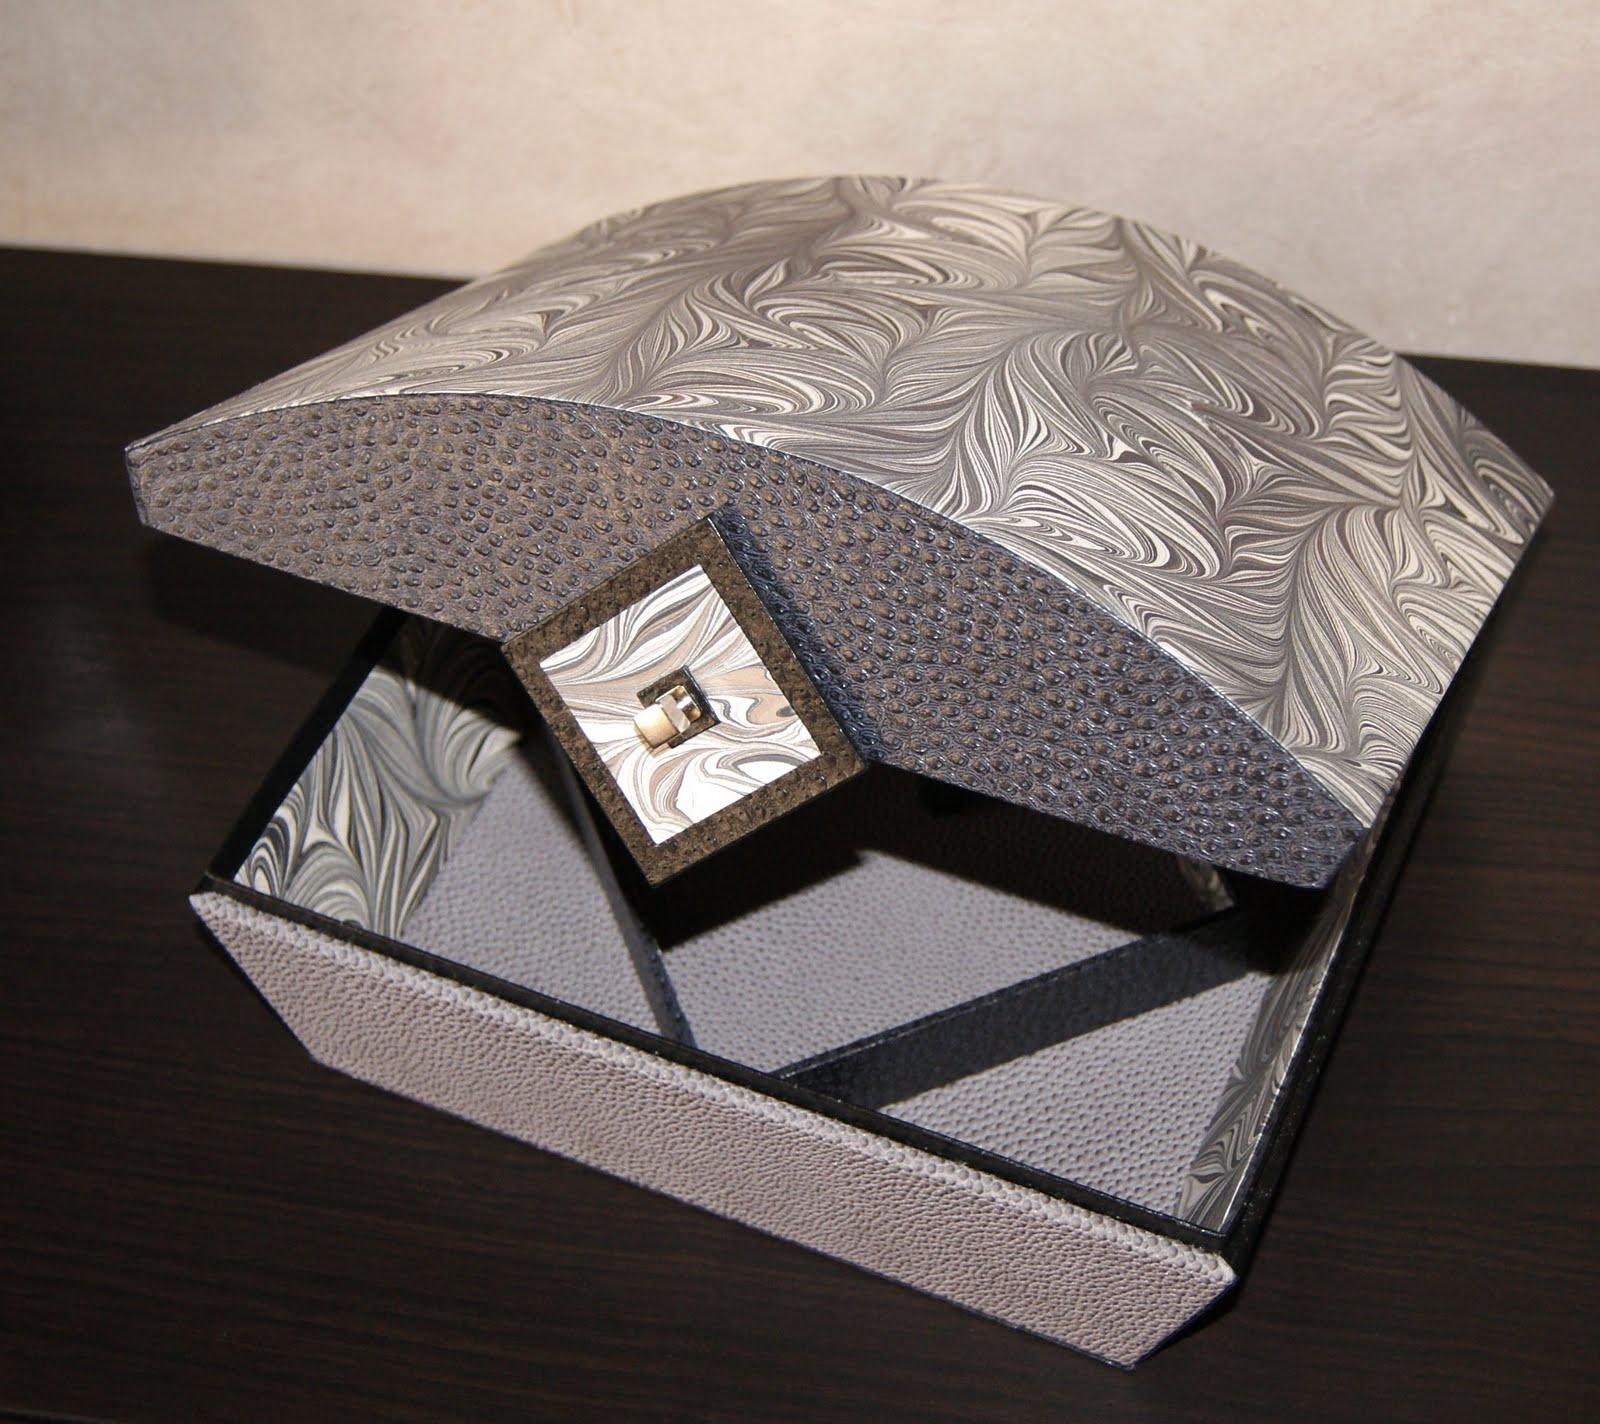 recreations bo te keiko. Black Bedroom Furniture Sets. Home Design Ideas